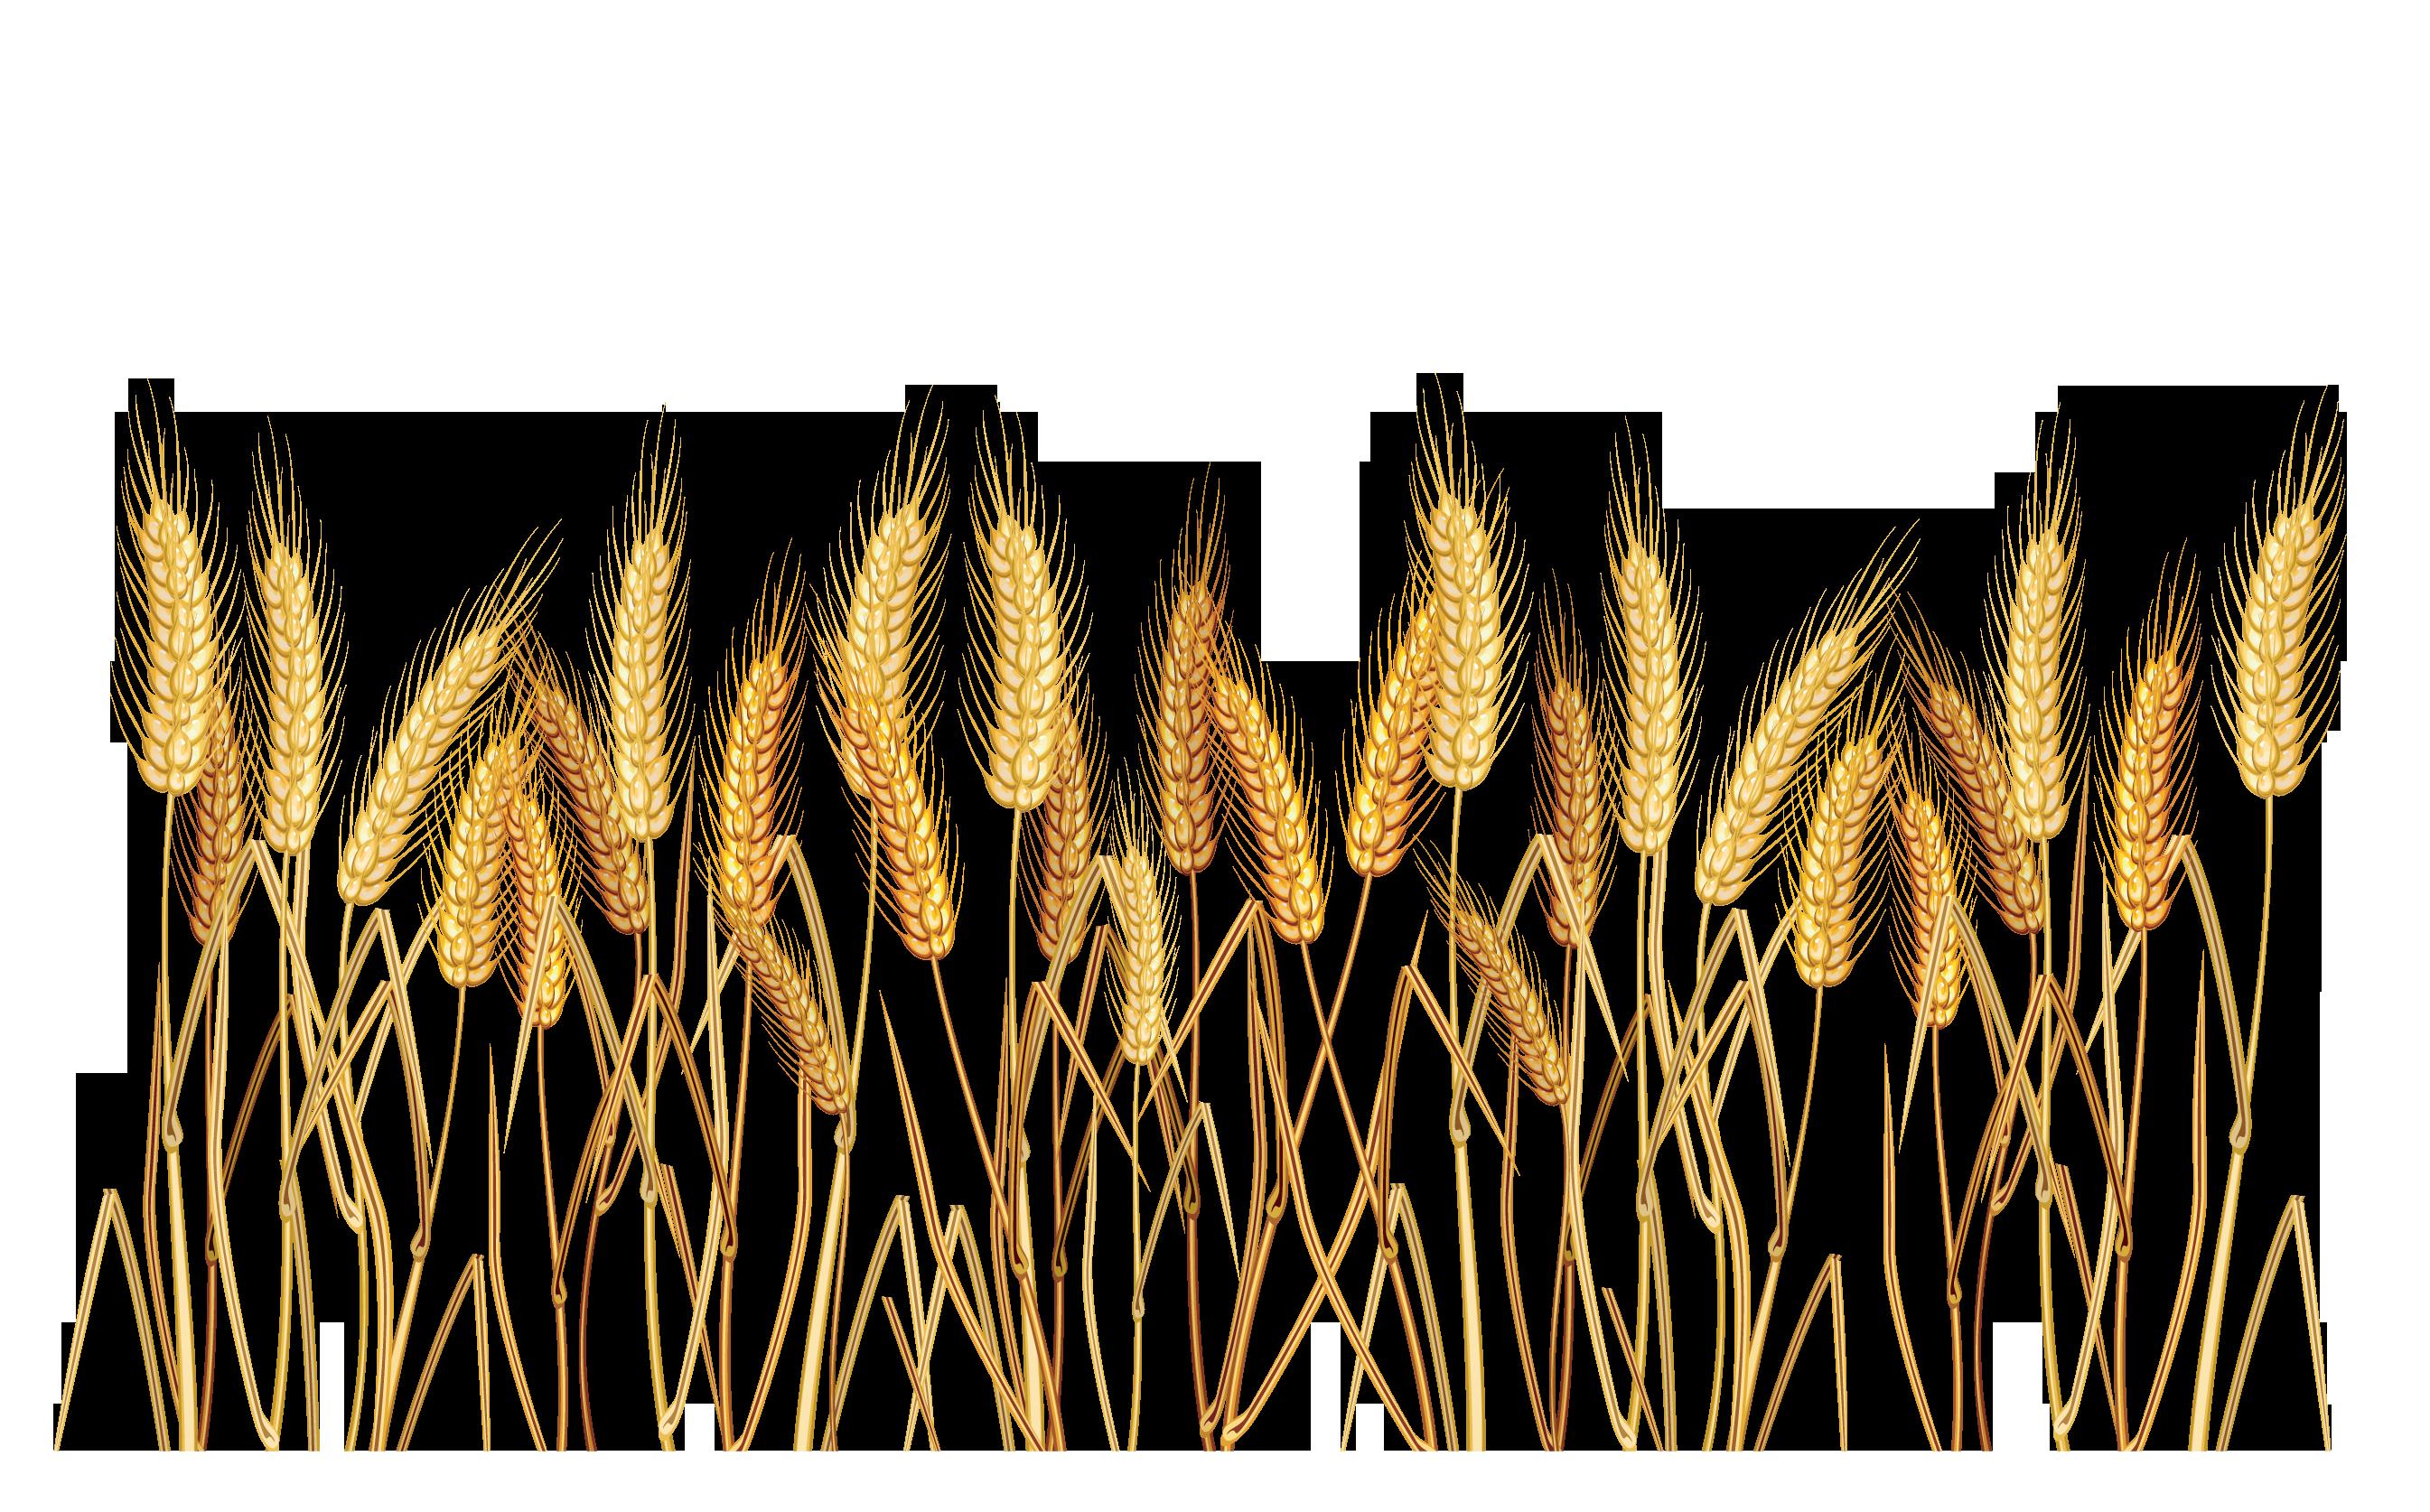 Malt clipart oat plant Wheatgrass  Transparent PNG PNG